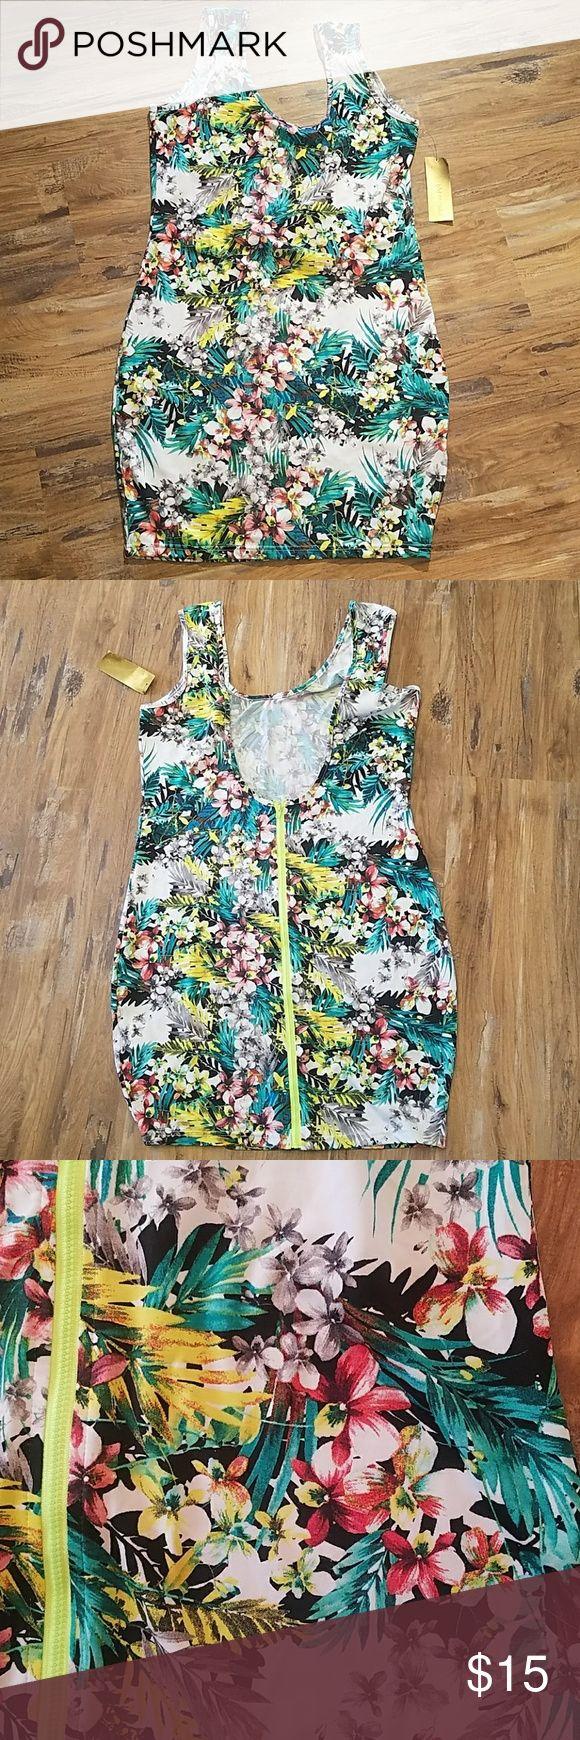 "NWT Nicki Minaj Summer Blossom Tank Dress, XL New Nicki Minaj Tank Dress, size XL. Polyester spandex blend. Scoop neck front with open scoop back and zipper. Lying flat measurements are Chest, 18"" Waist, 17"" Length from shoulder, 35.5"" Nicki Minaj Dresses Mini"